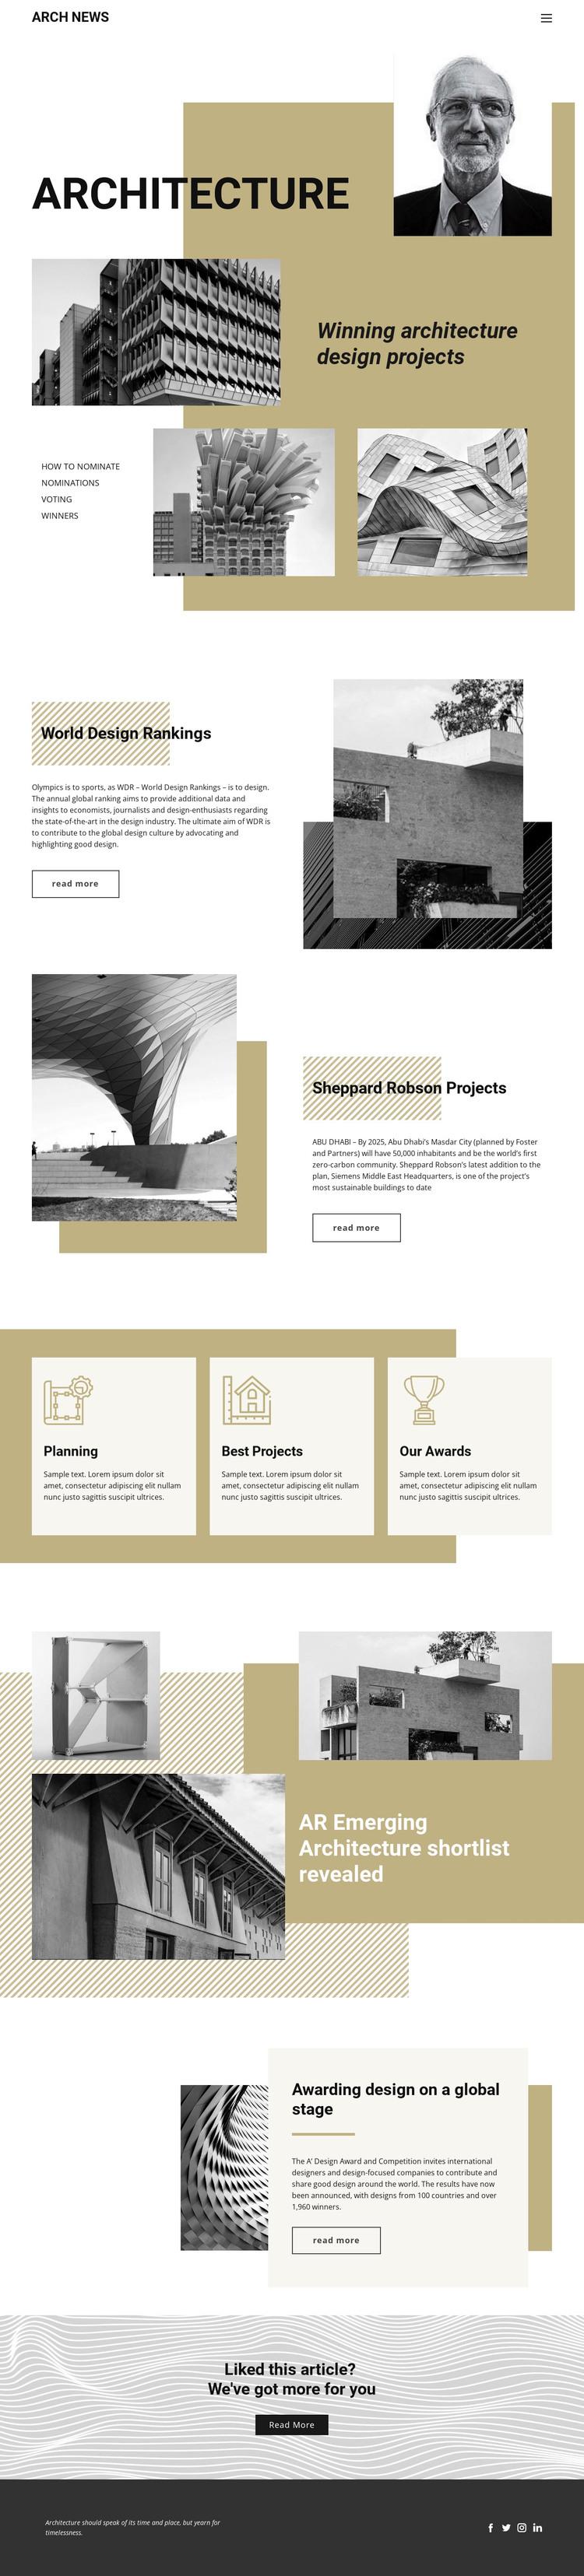 Design of Architecture WordPress Theme